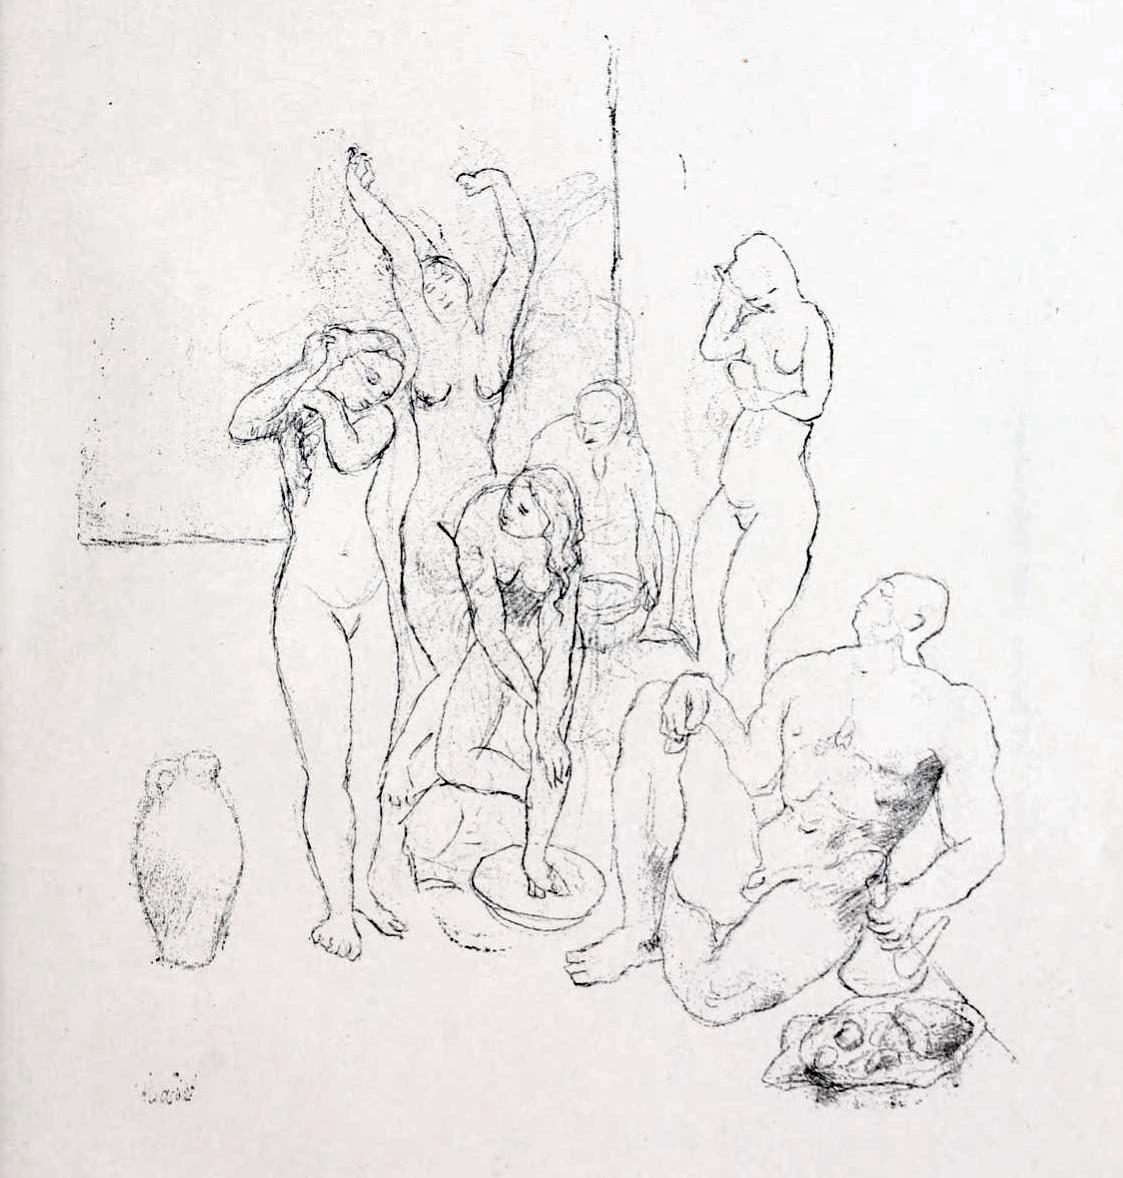 File Pablo Picasso 1905 Nus Nudes Pencil On Paper Jpg Wikipedia